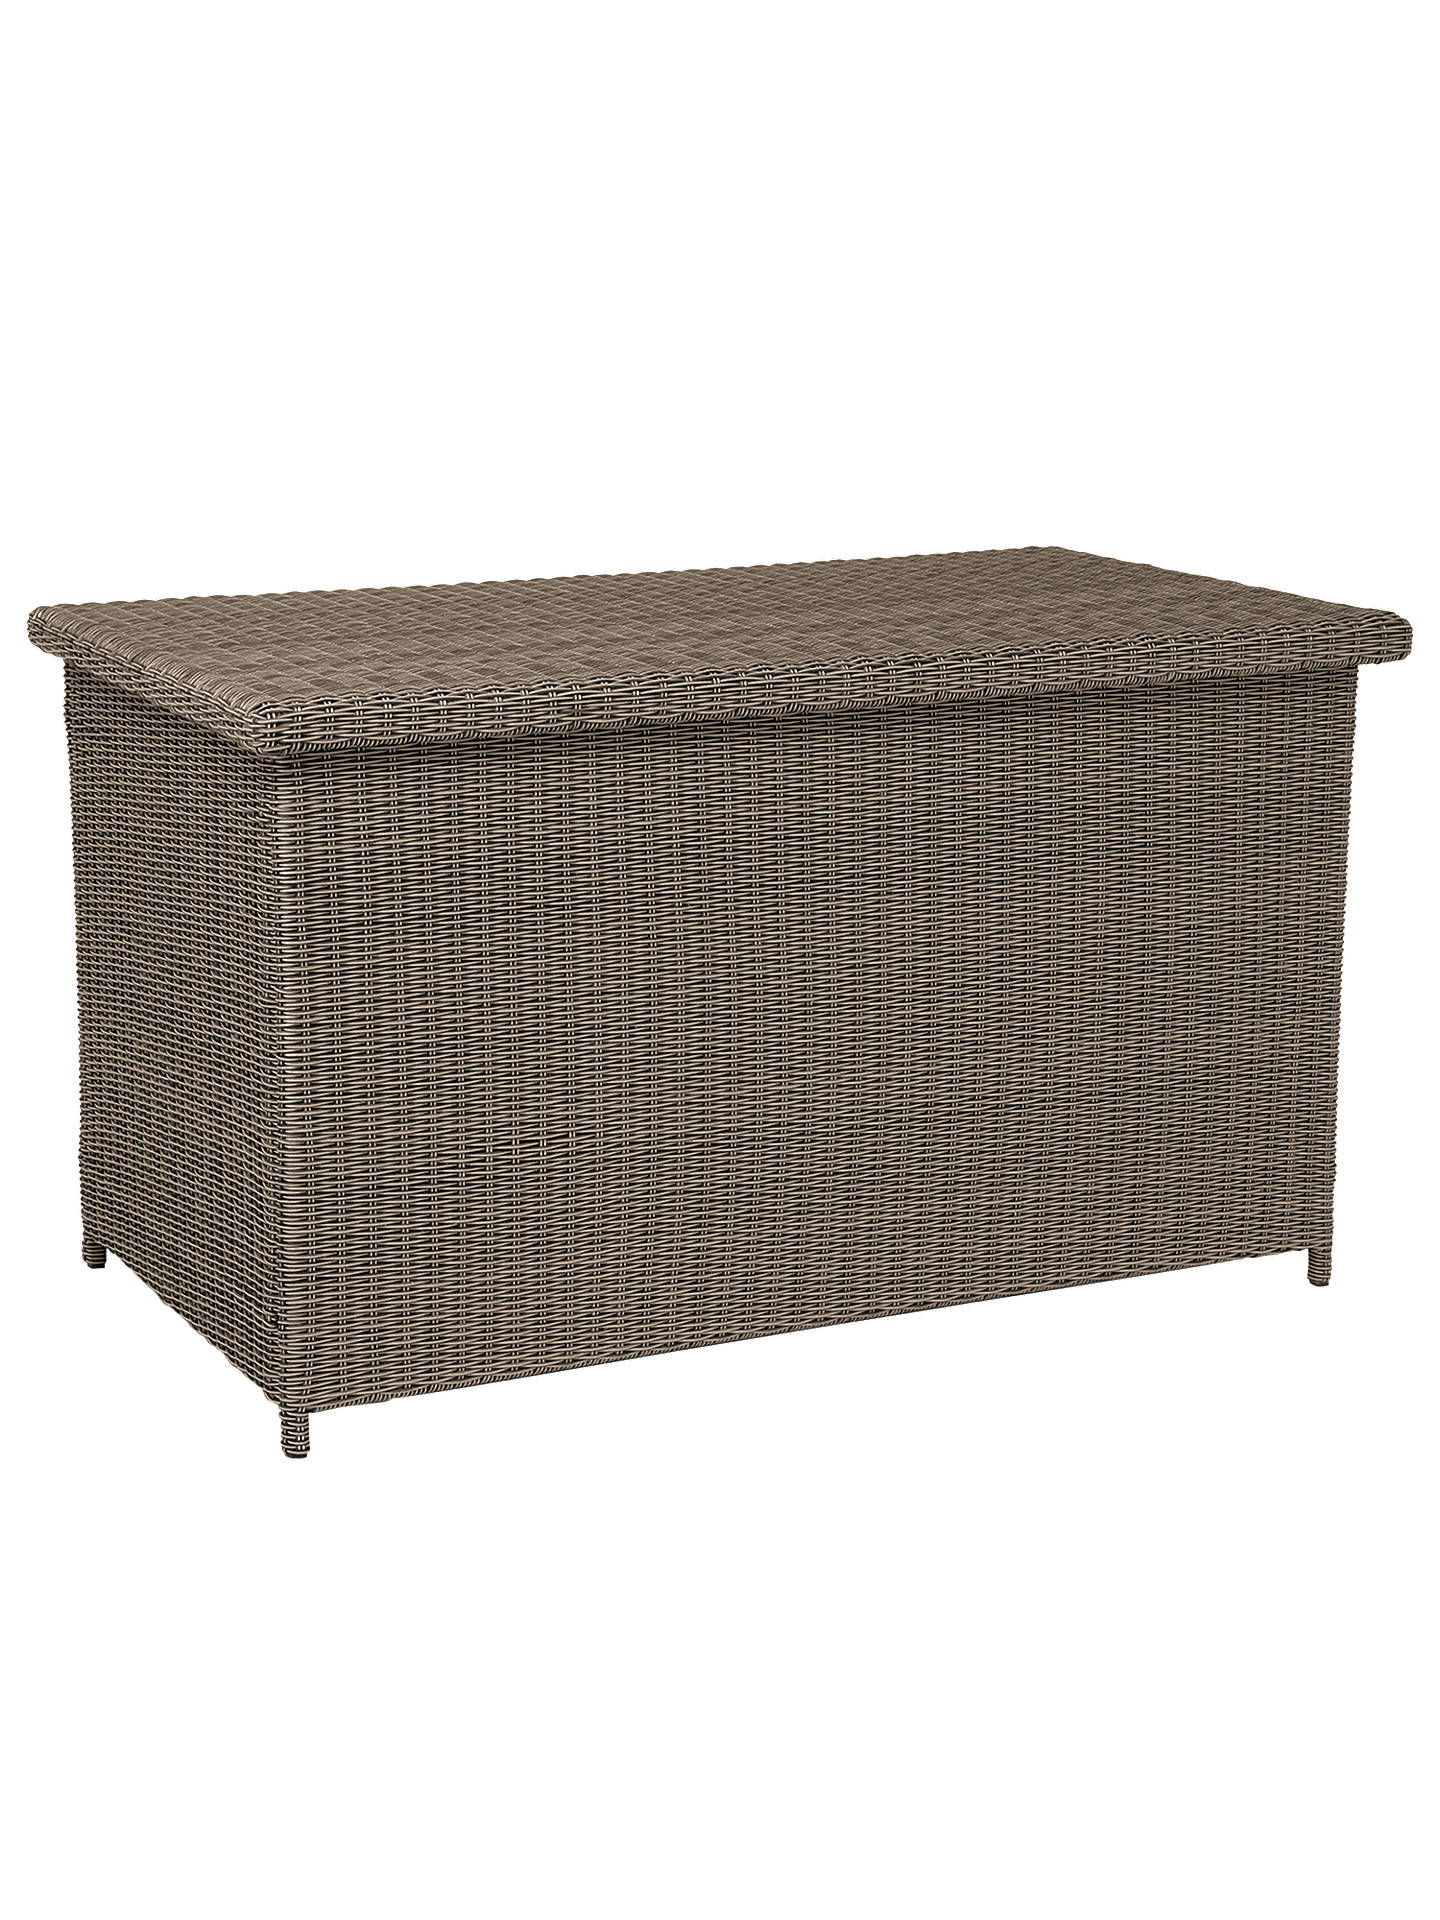 Kettler Palma Outdoor Cushion Storage Box At John Lewis Partners